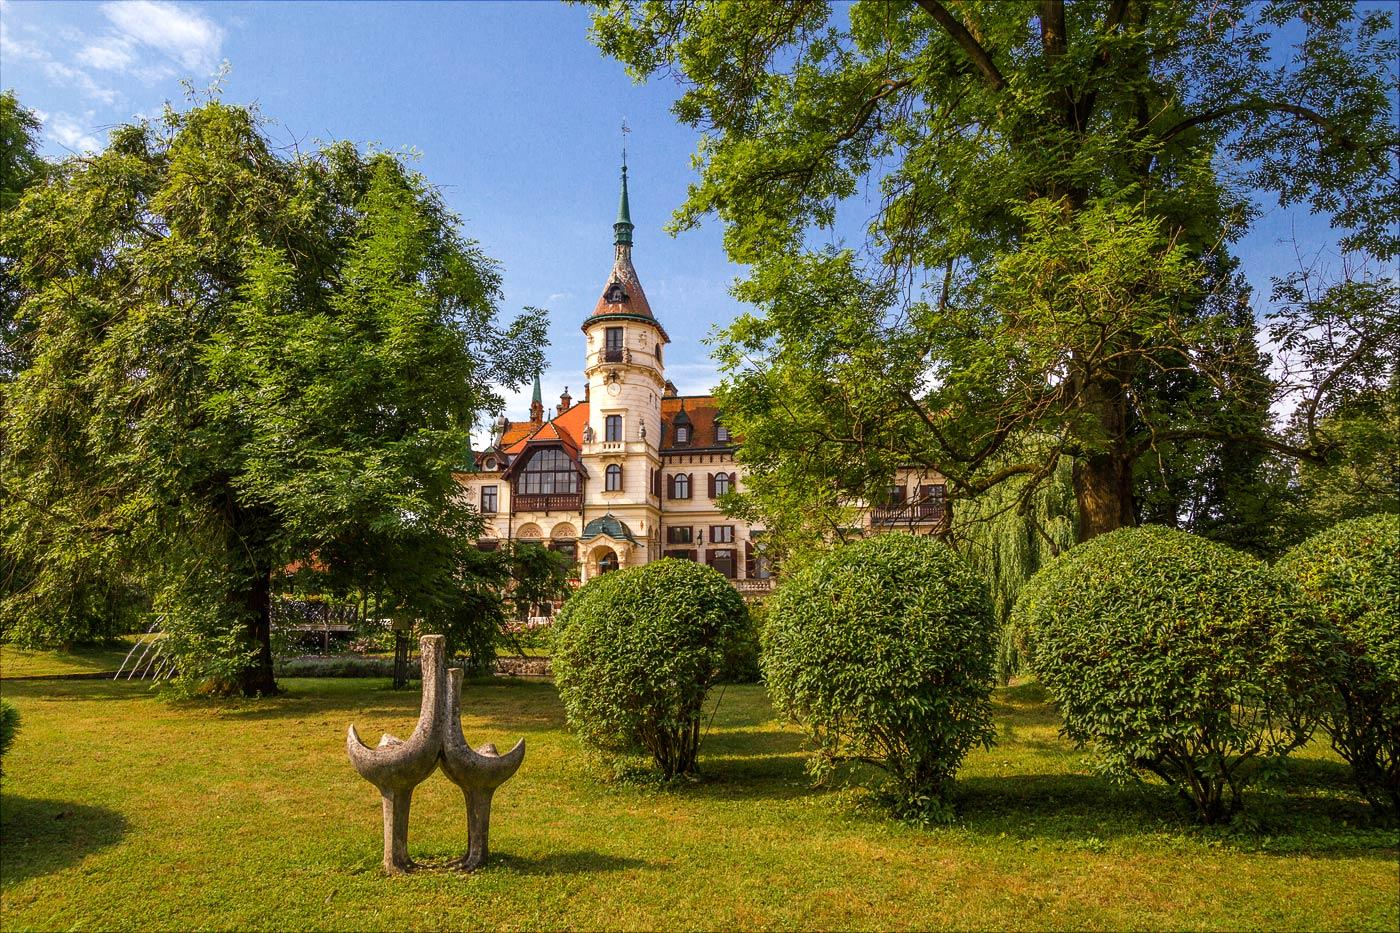 Дворец Лешна в Злинском зоопарке